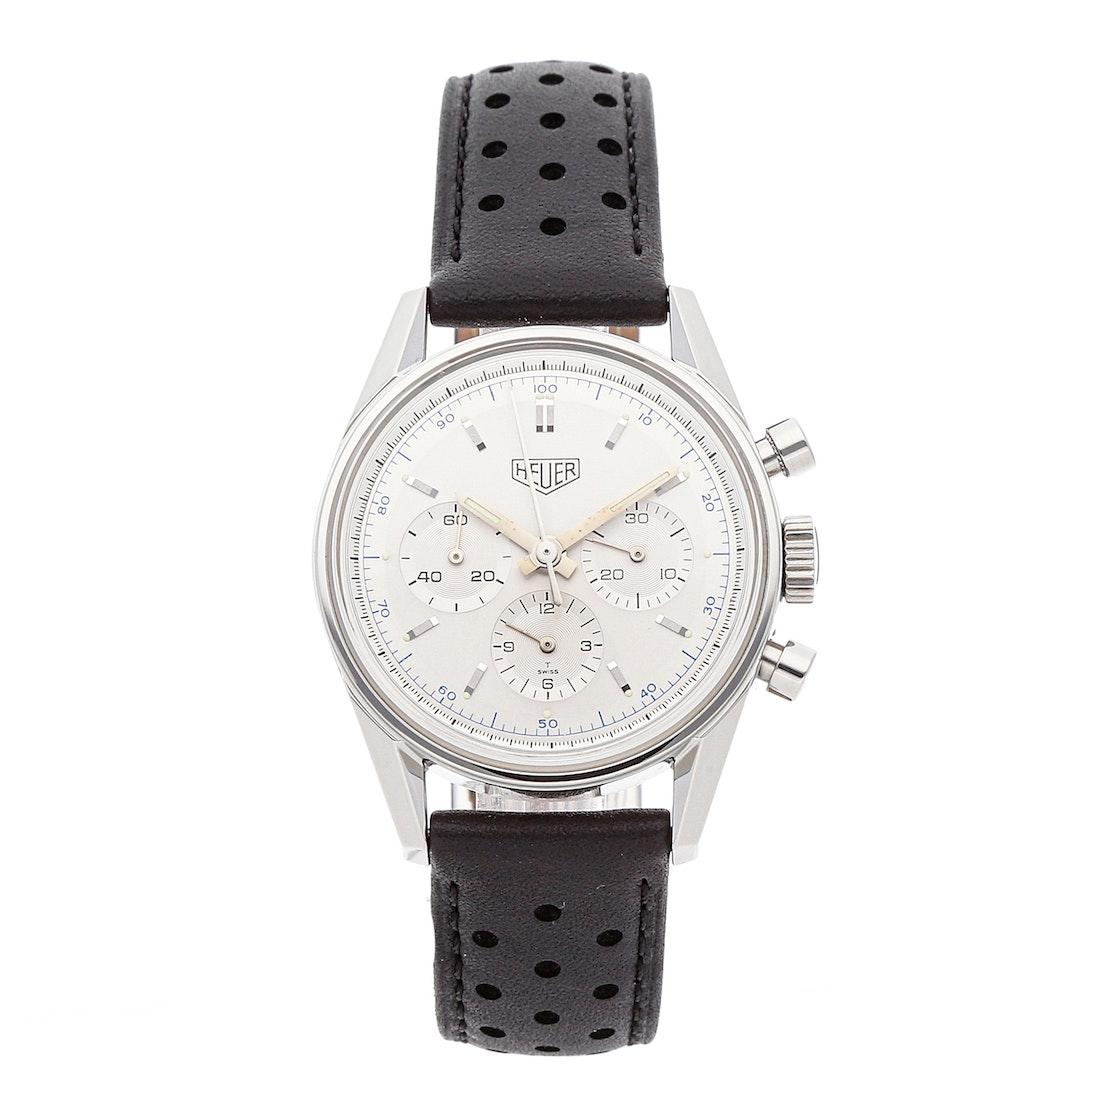 Tag Heuer Carrera Chronograph 1964 Re-Edition CS3110 BC0725